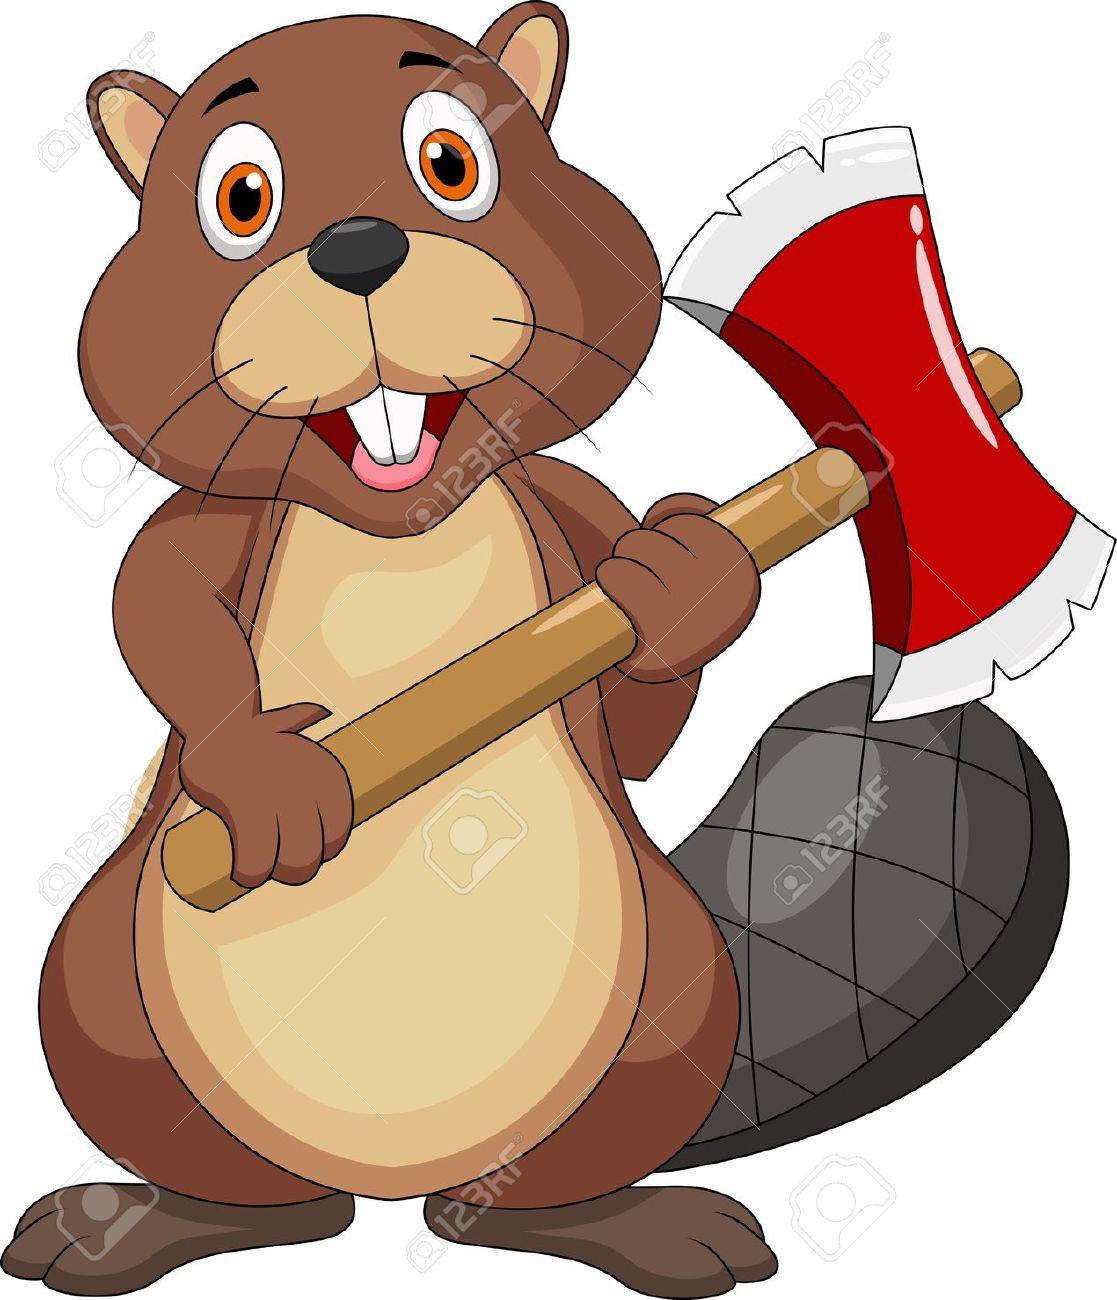 beaver%20clipart%20